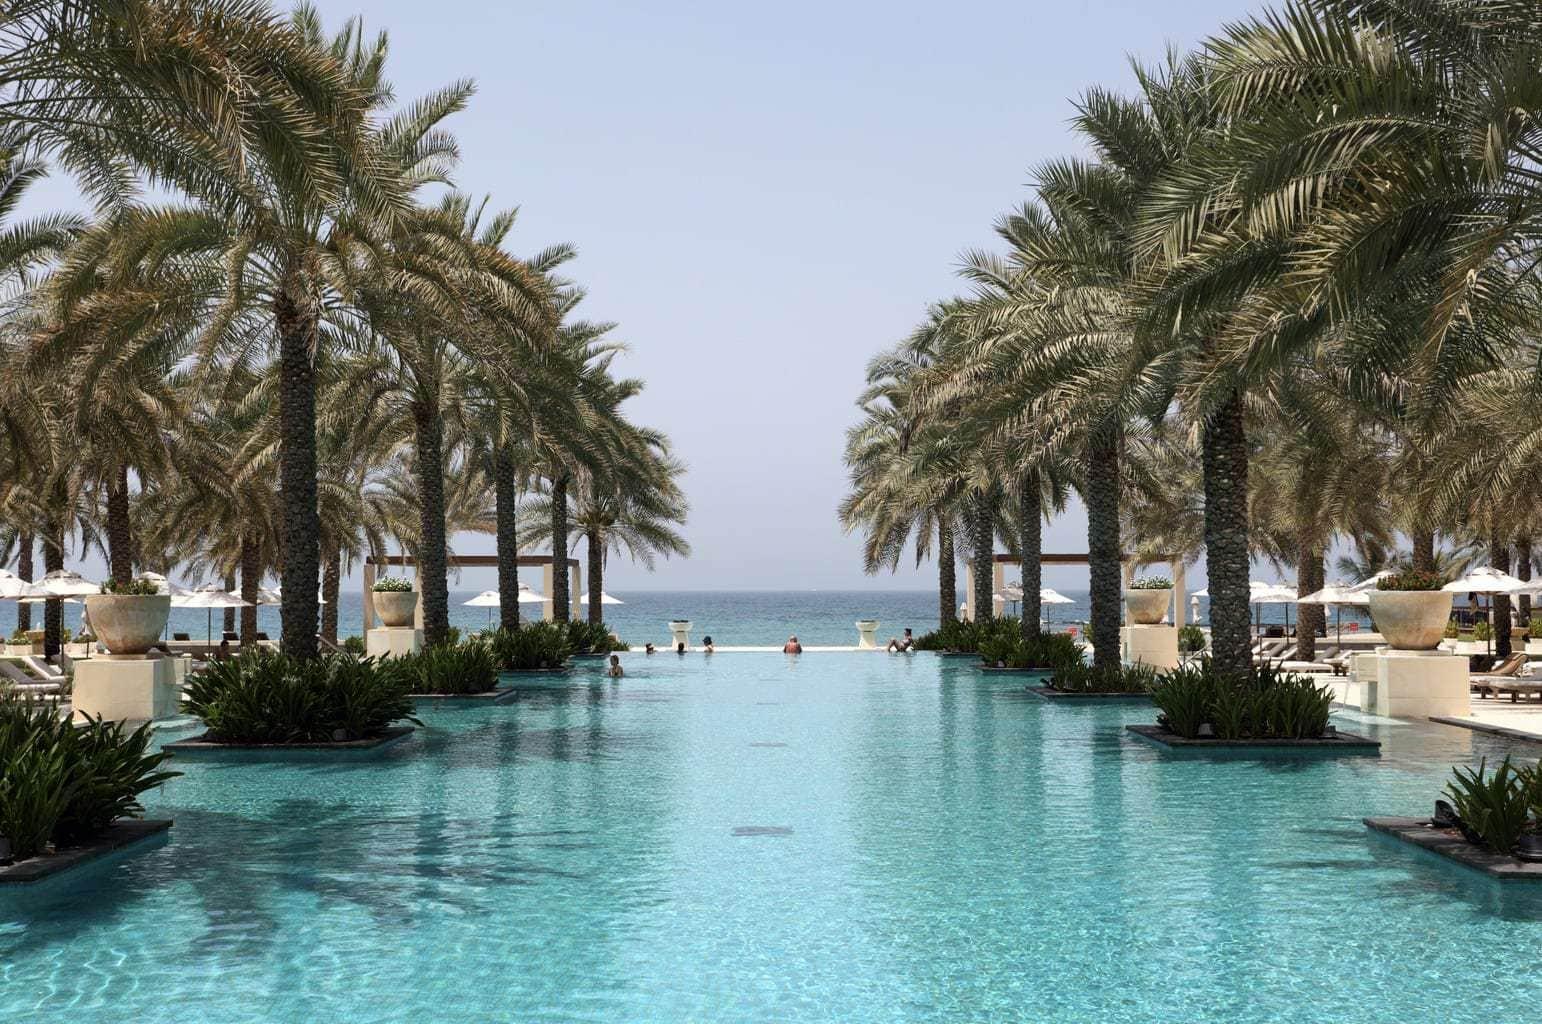 10 Travel Essentials for a Luxury Trip